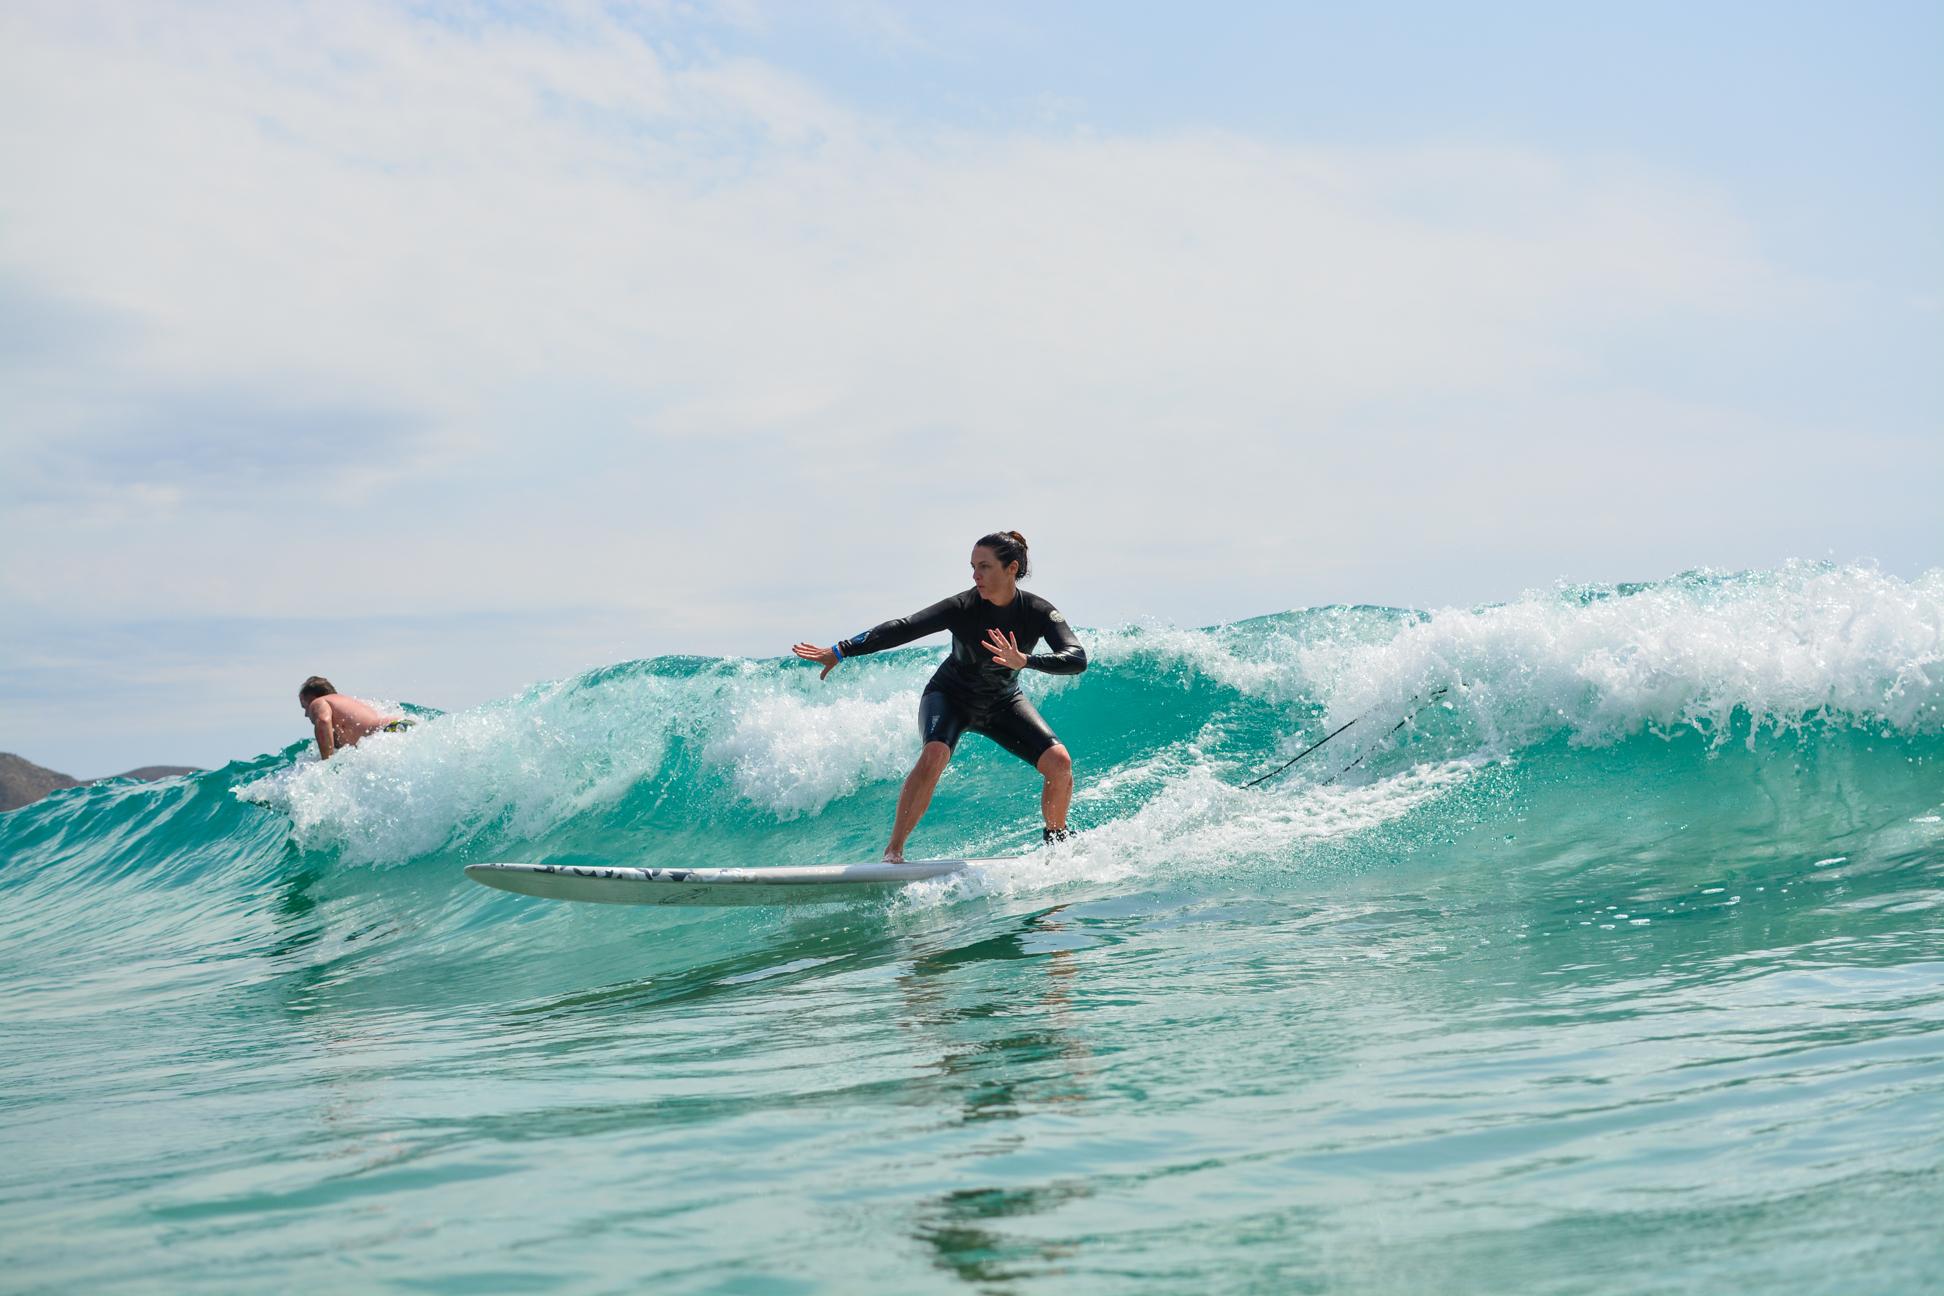 Private winter surf tuition at Cerritos, Baja California, Mexico